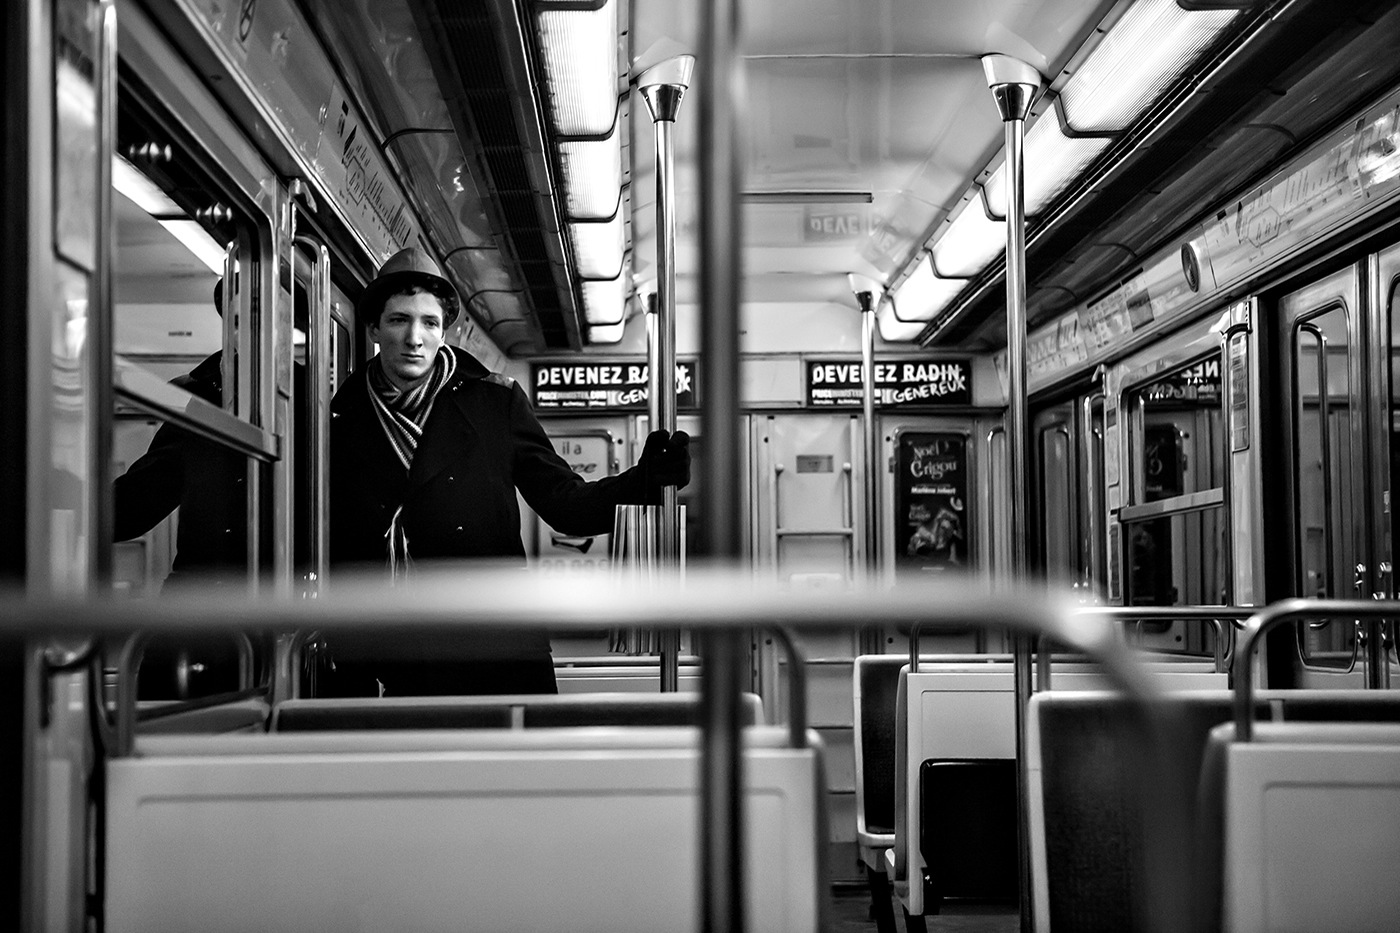 Métro - Homme seul